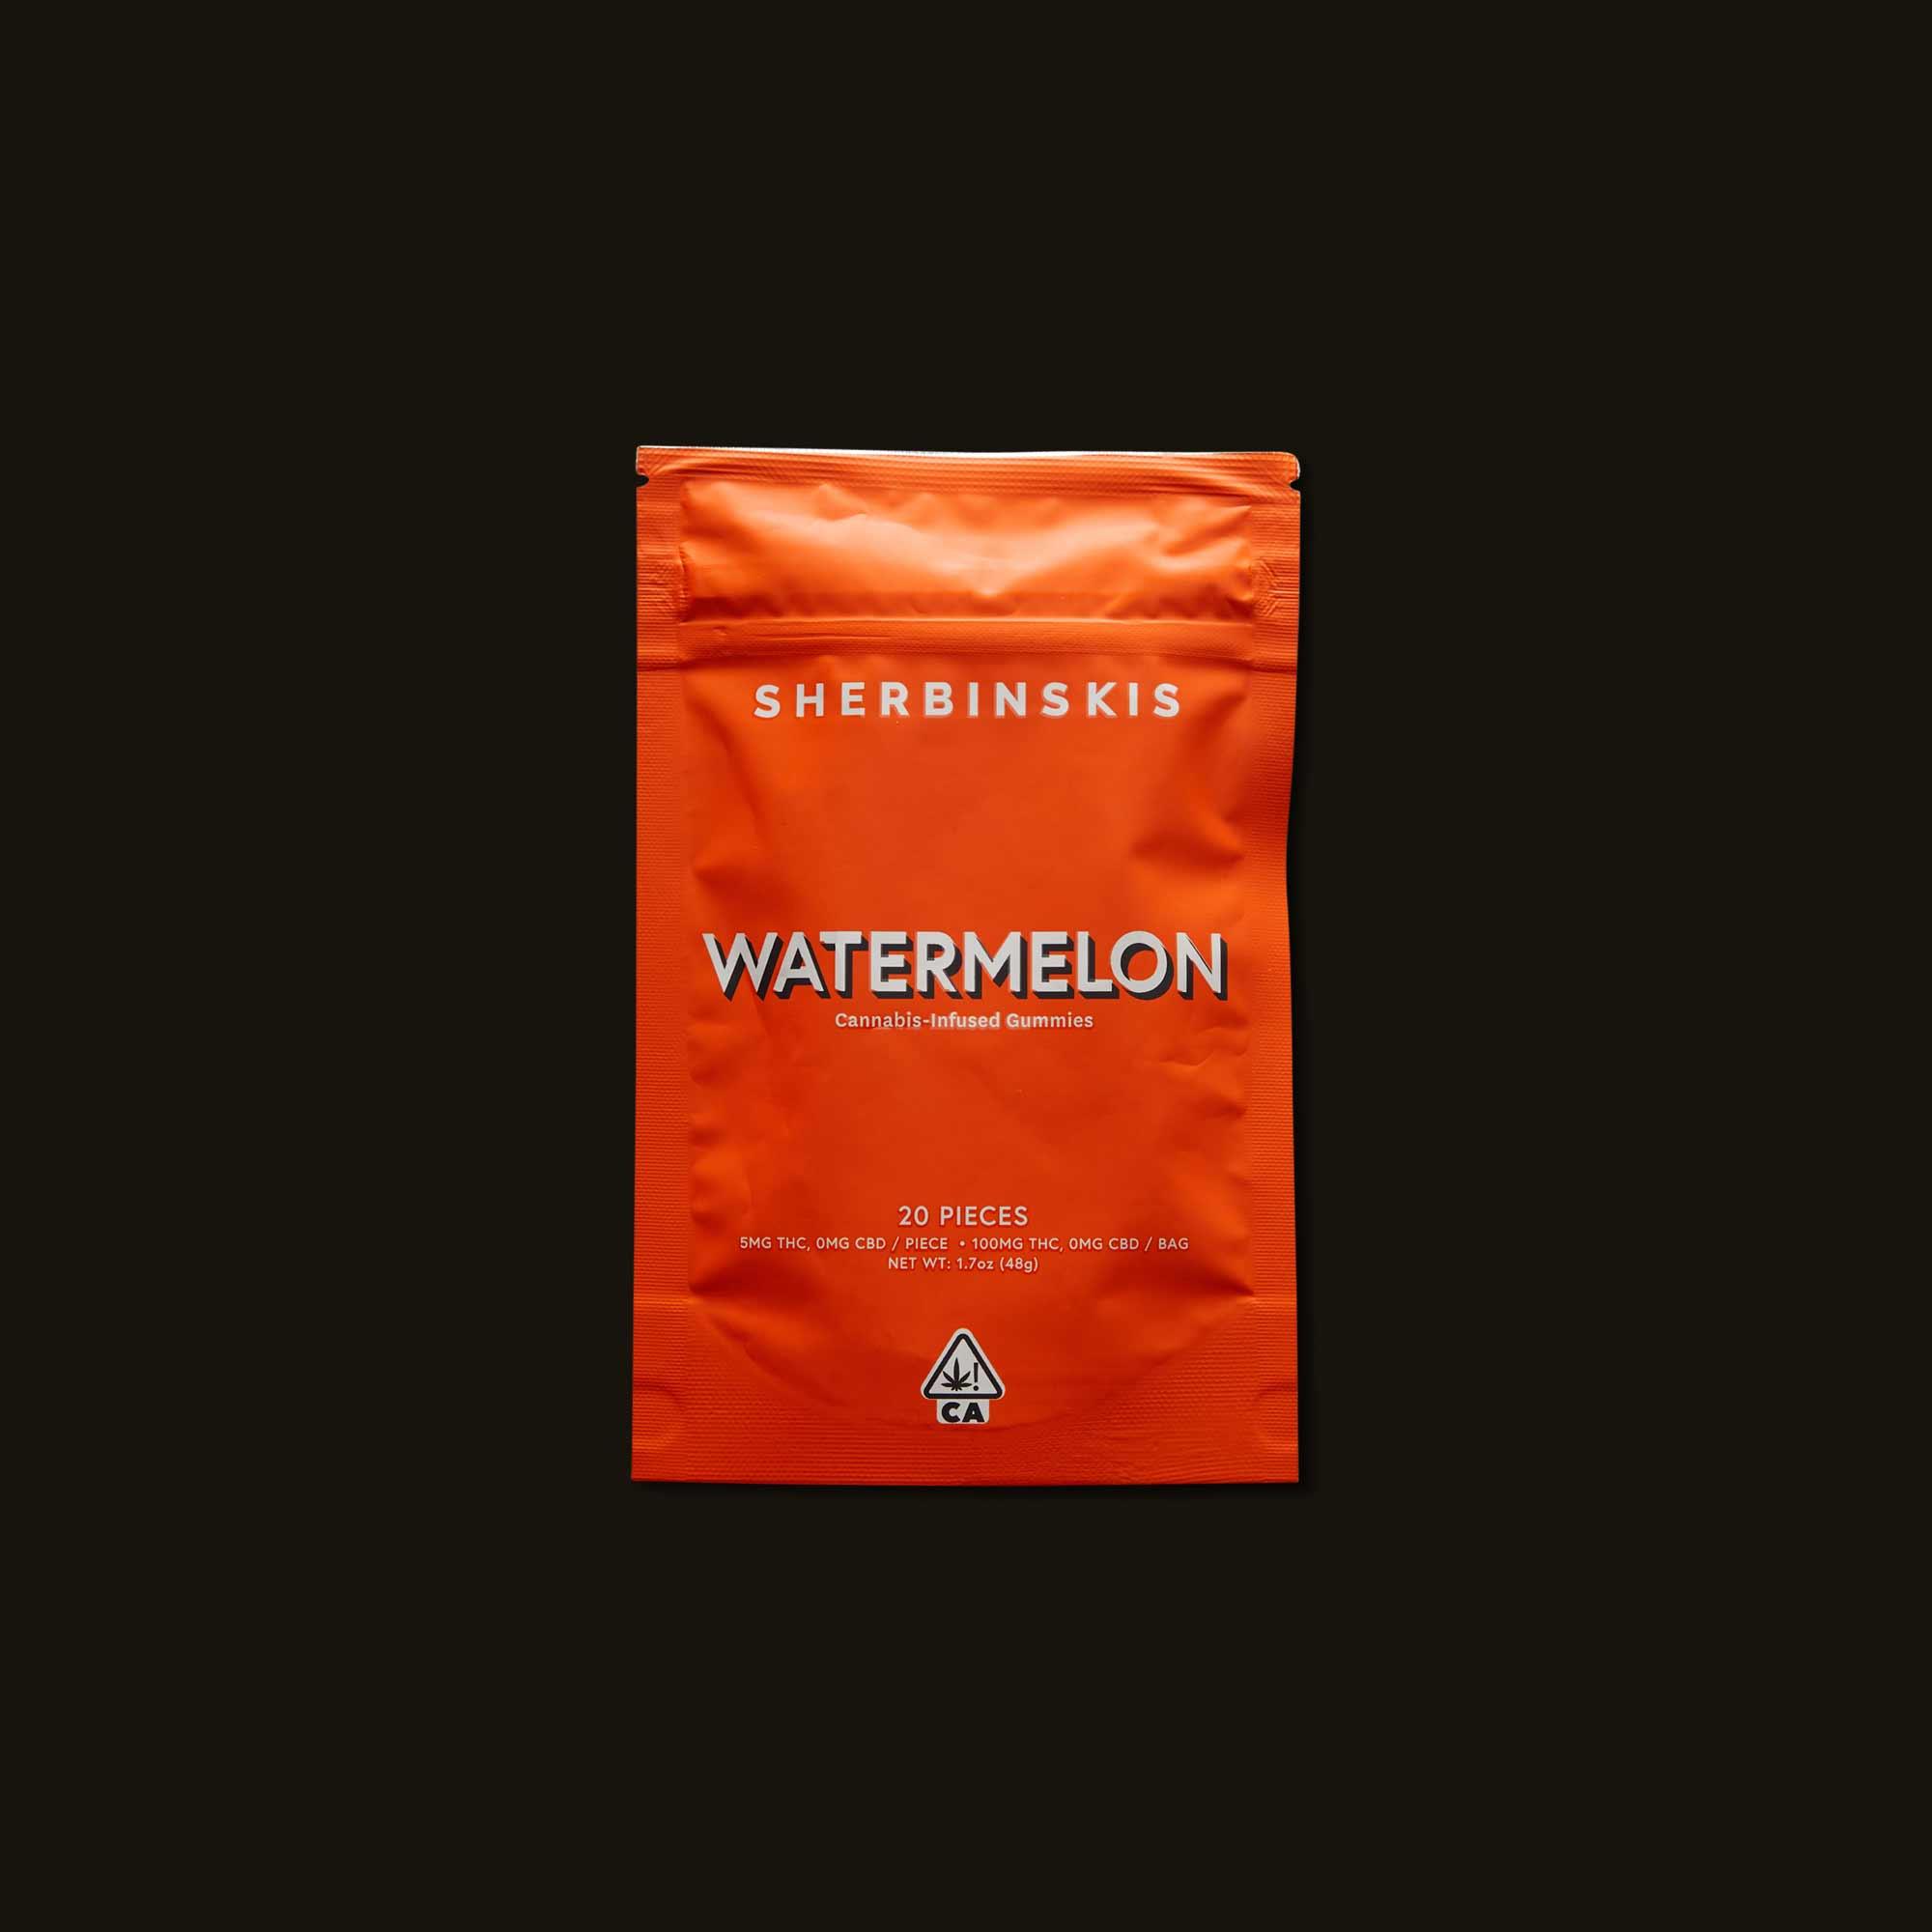 Sherbinskis Watermelon Gummies